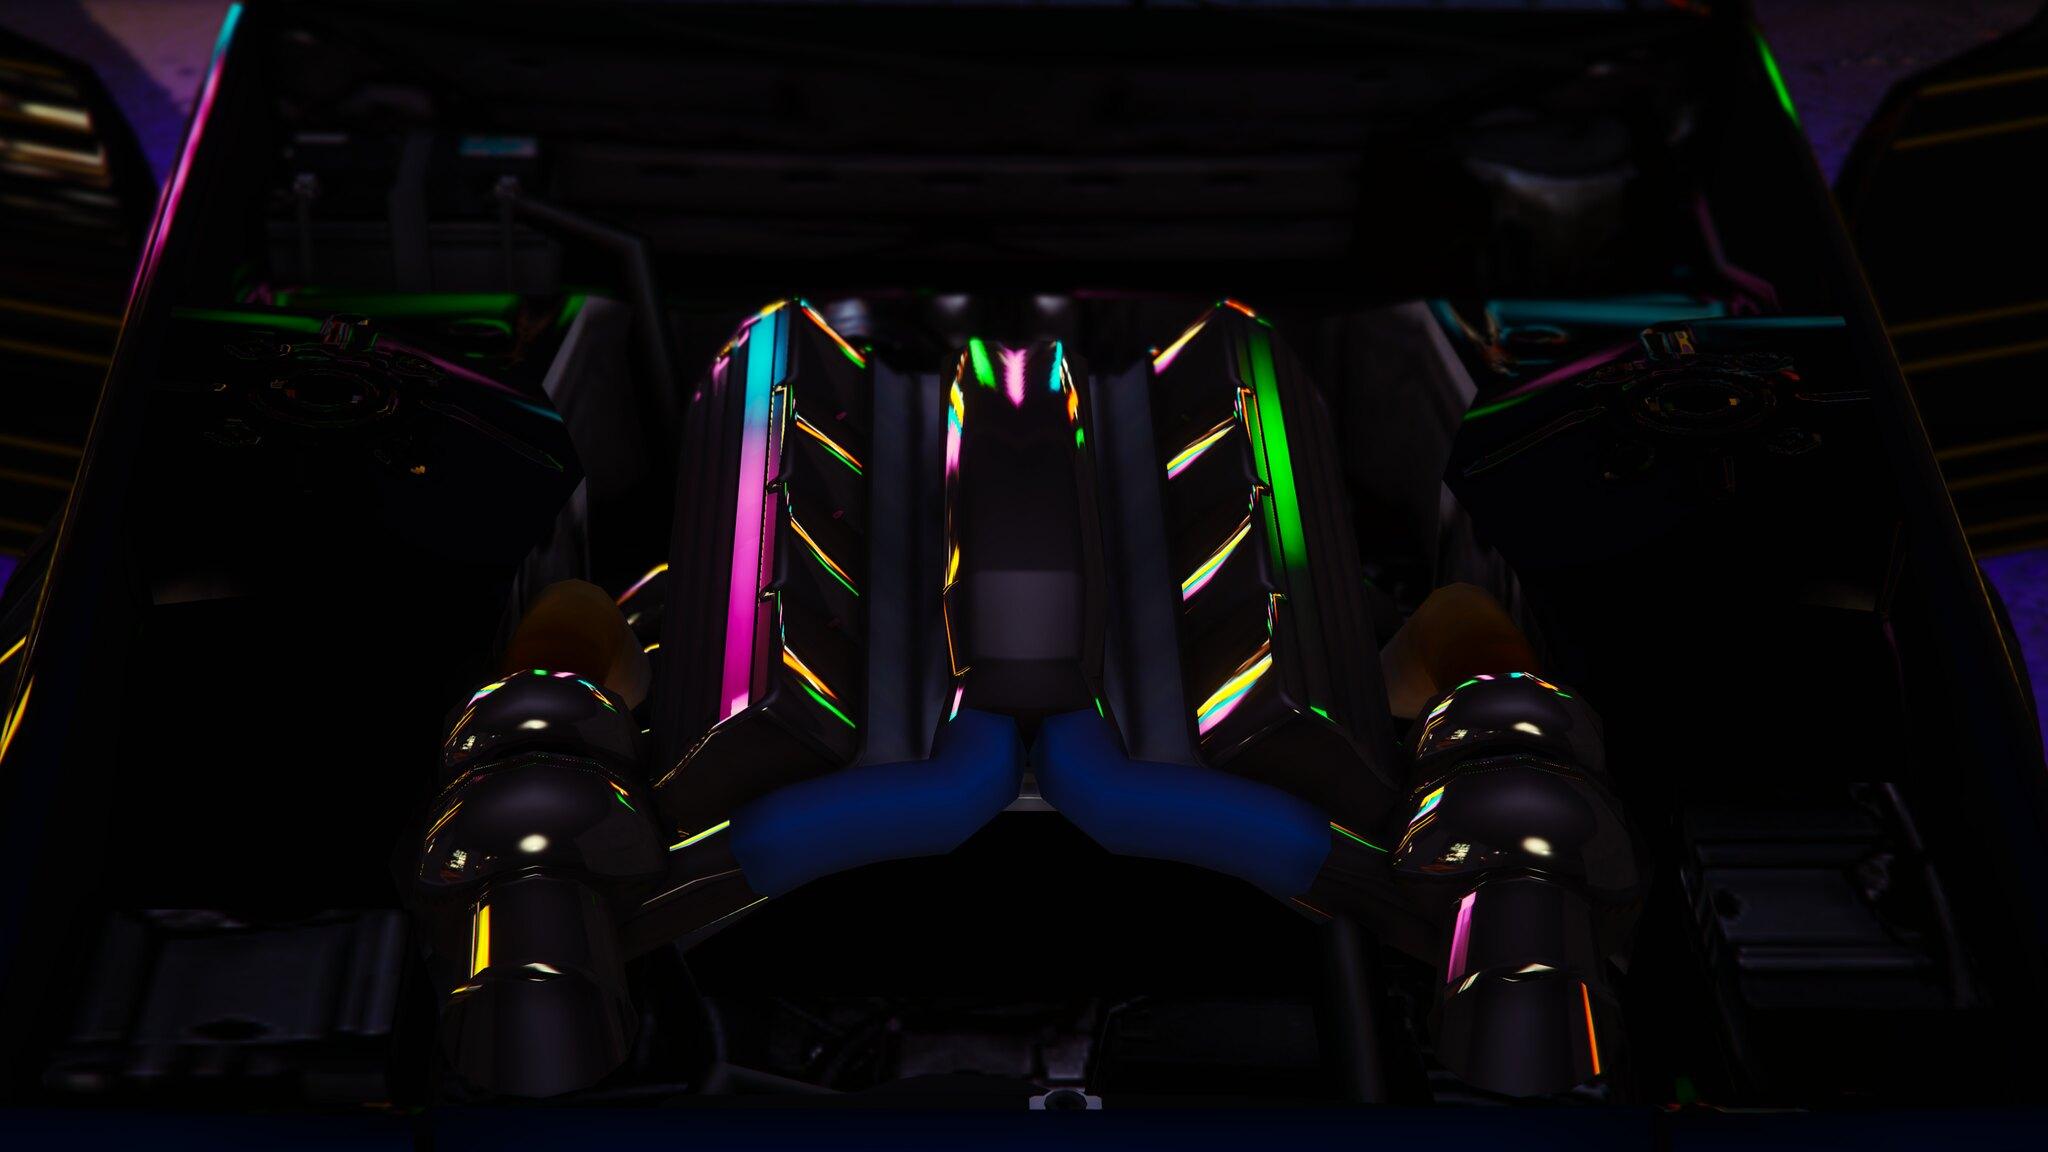 GTA V Screenshots (Official)   - Page 3 21818136724_e3617c309f_k